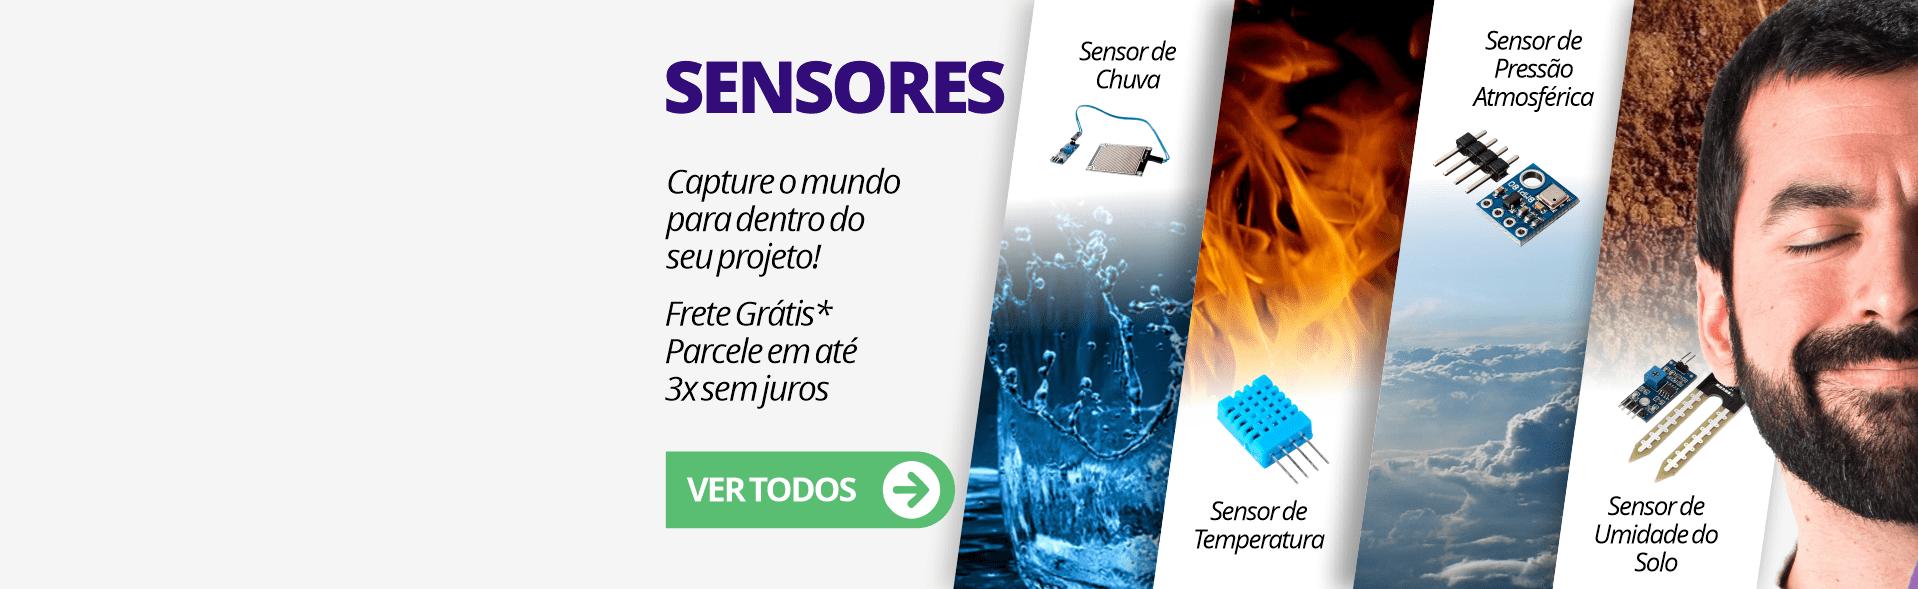 banner sensores